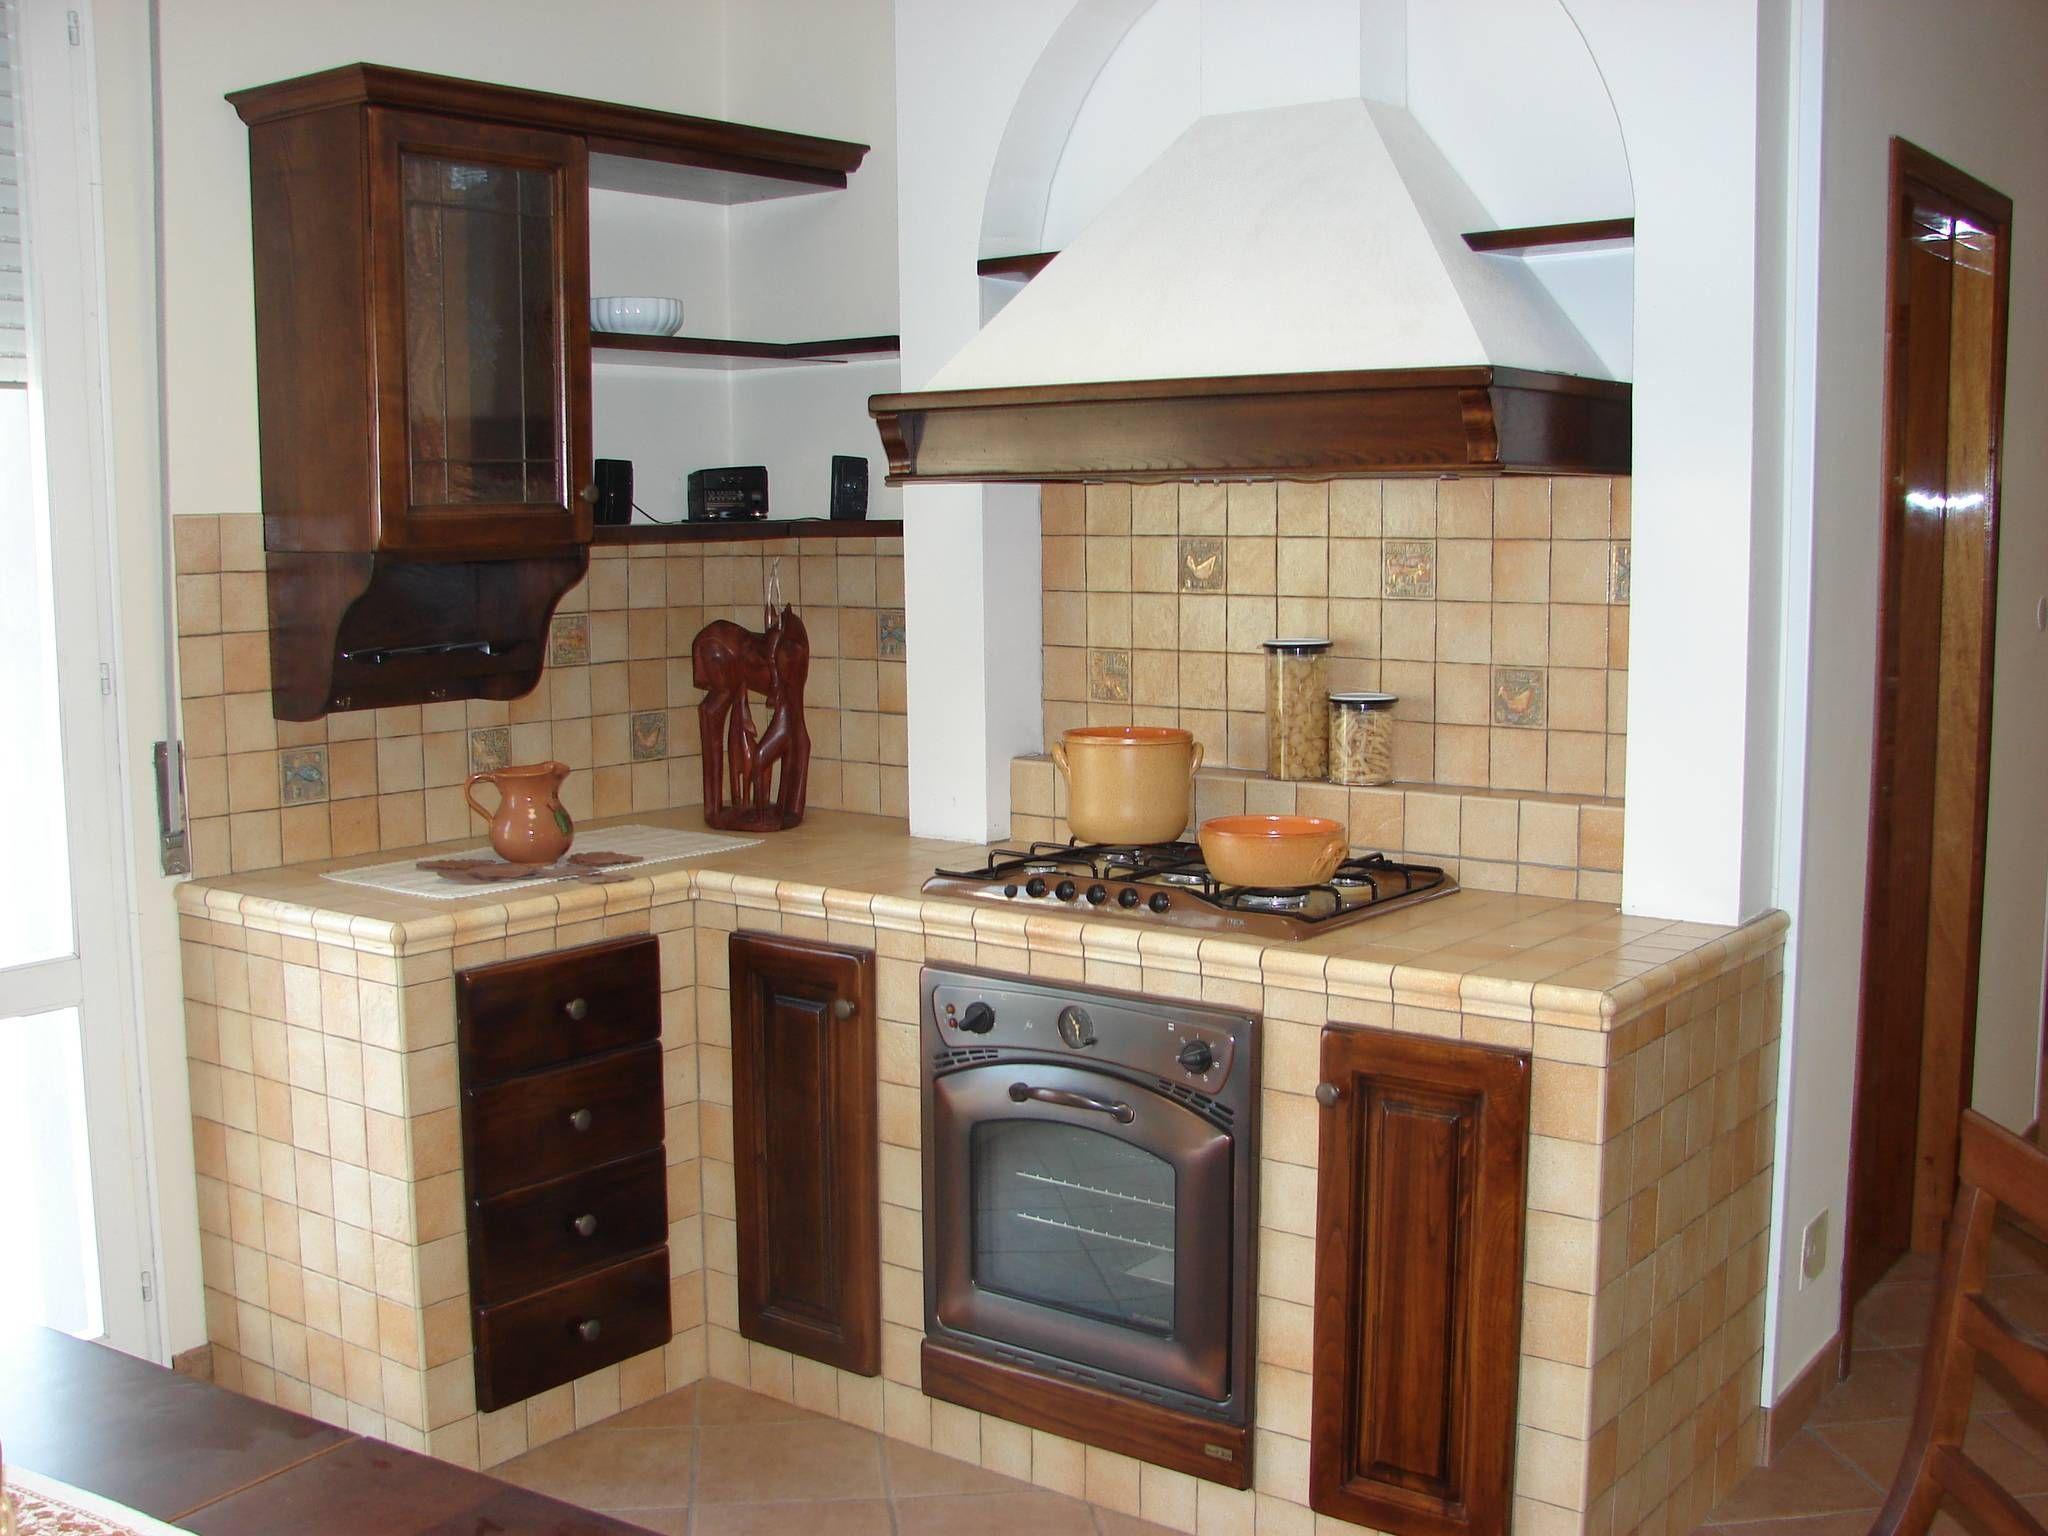 Cucina in muratura pesquisa google kitchen cucina cozinha designer pinterest cucina - Cucinini in muratura ...